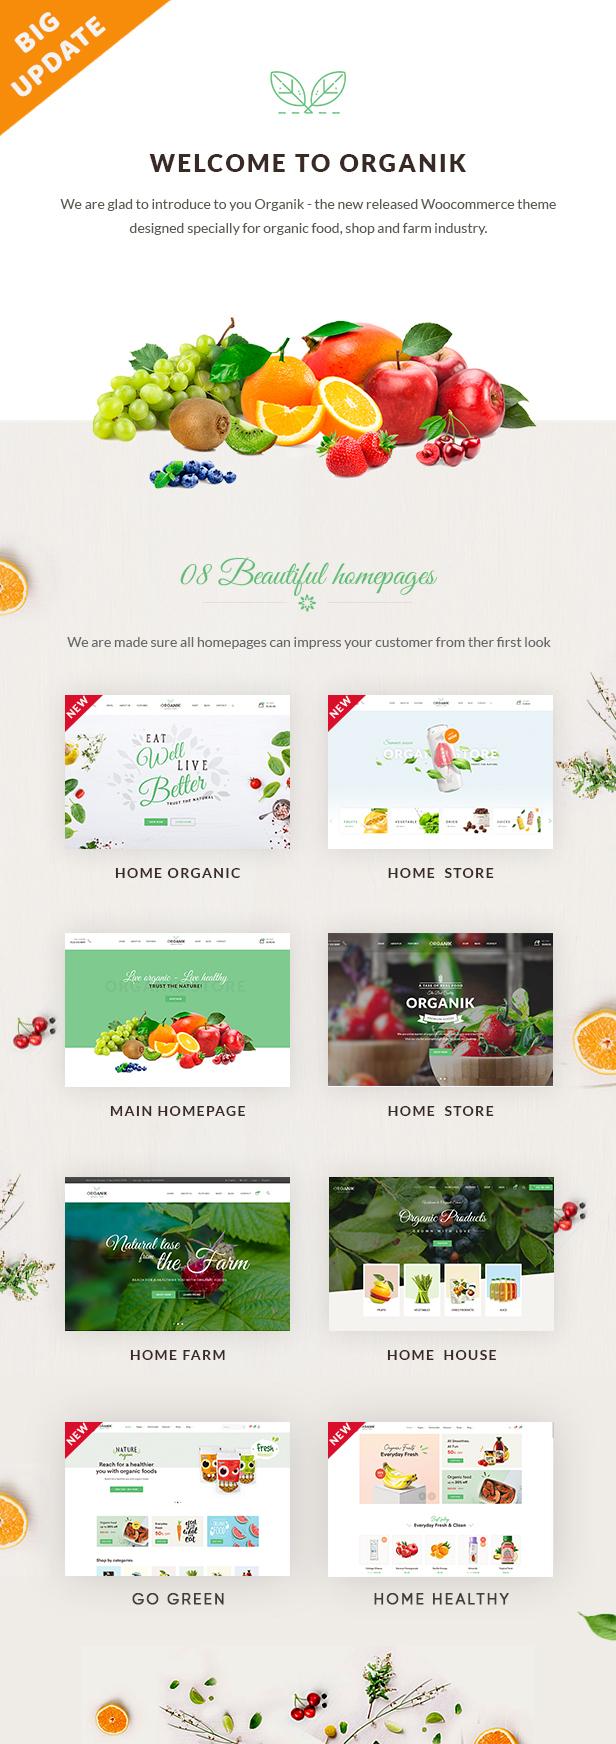 home - Organik - Organic Food Store WordPress Theme